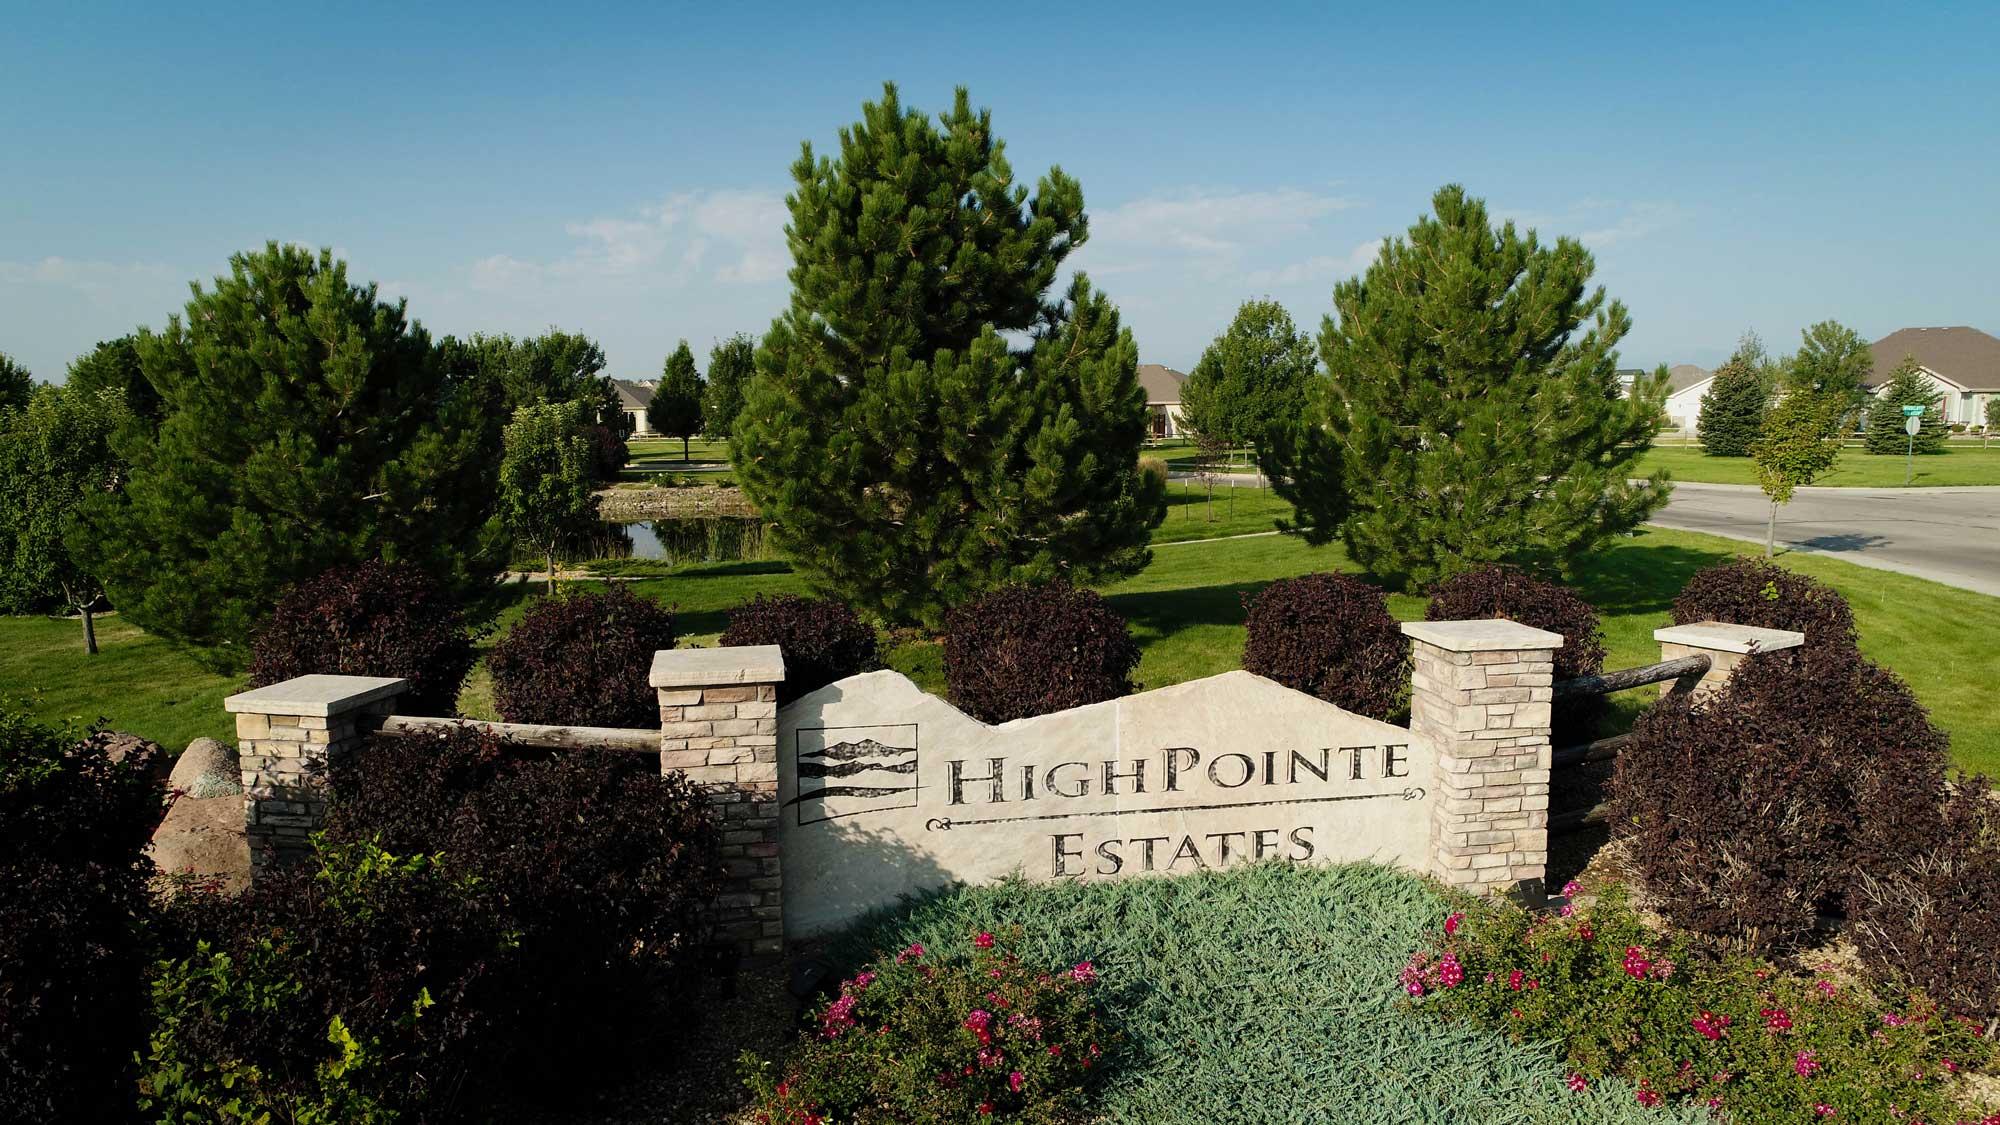 HighPointe-14.jpg